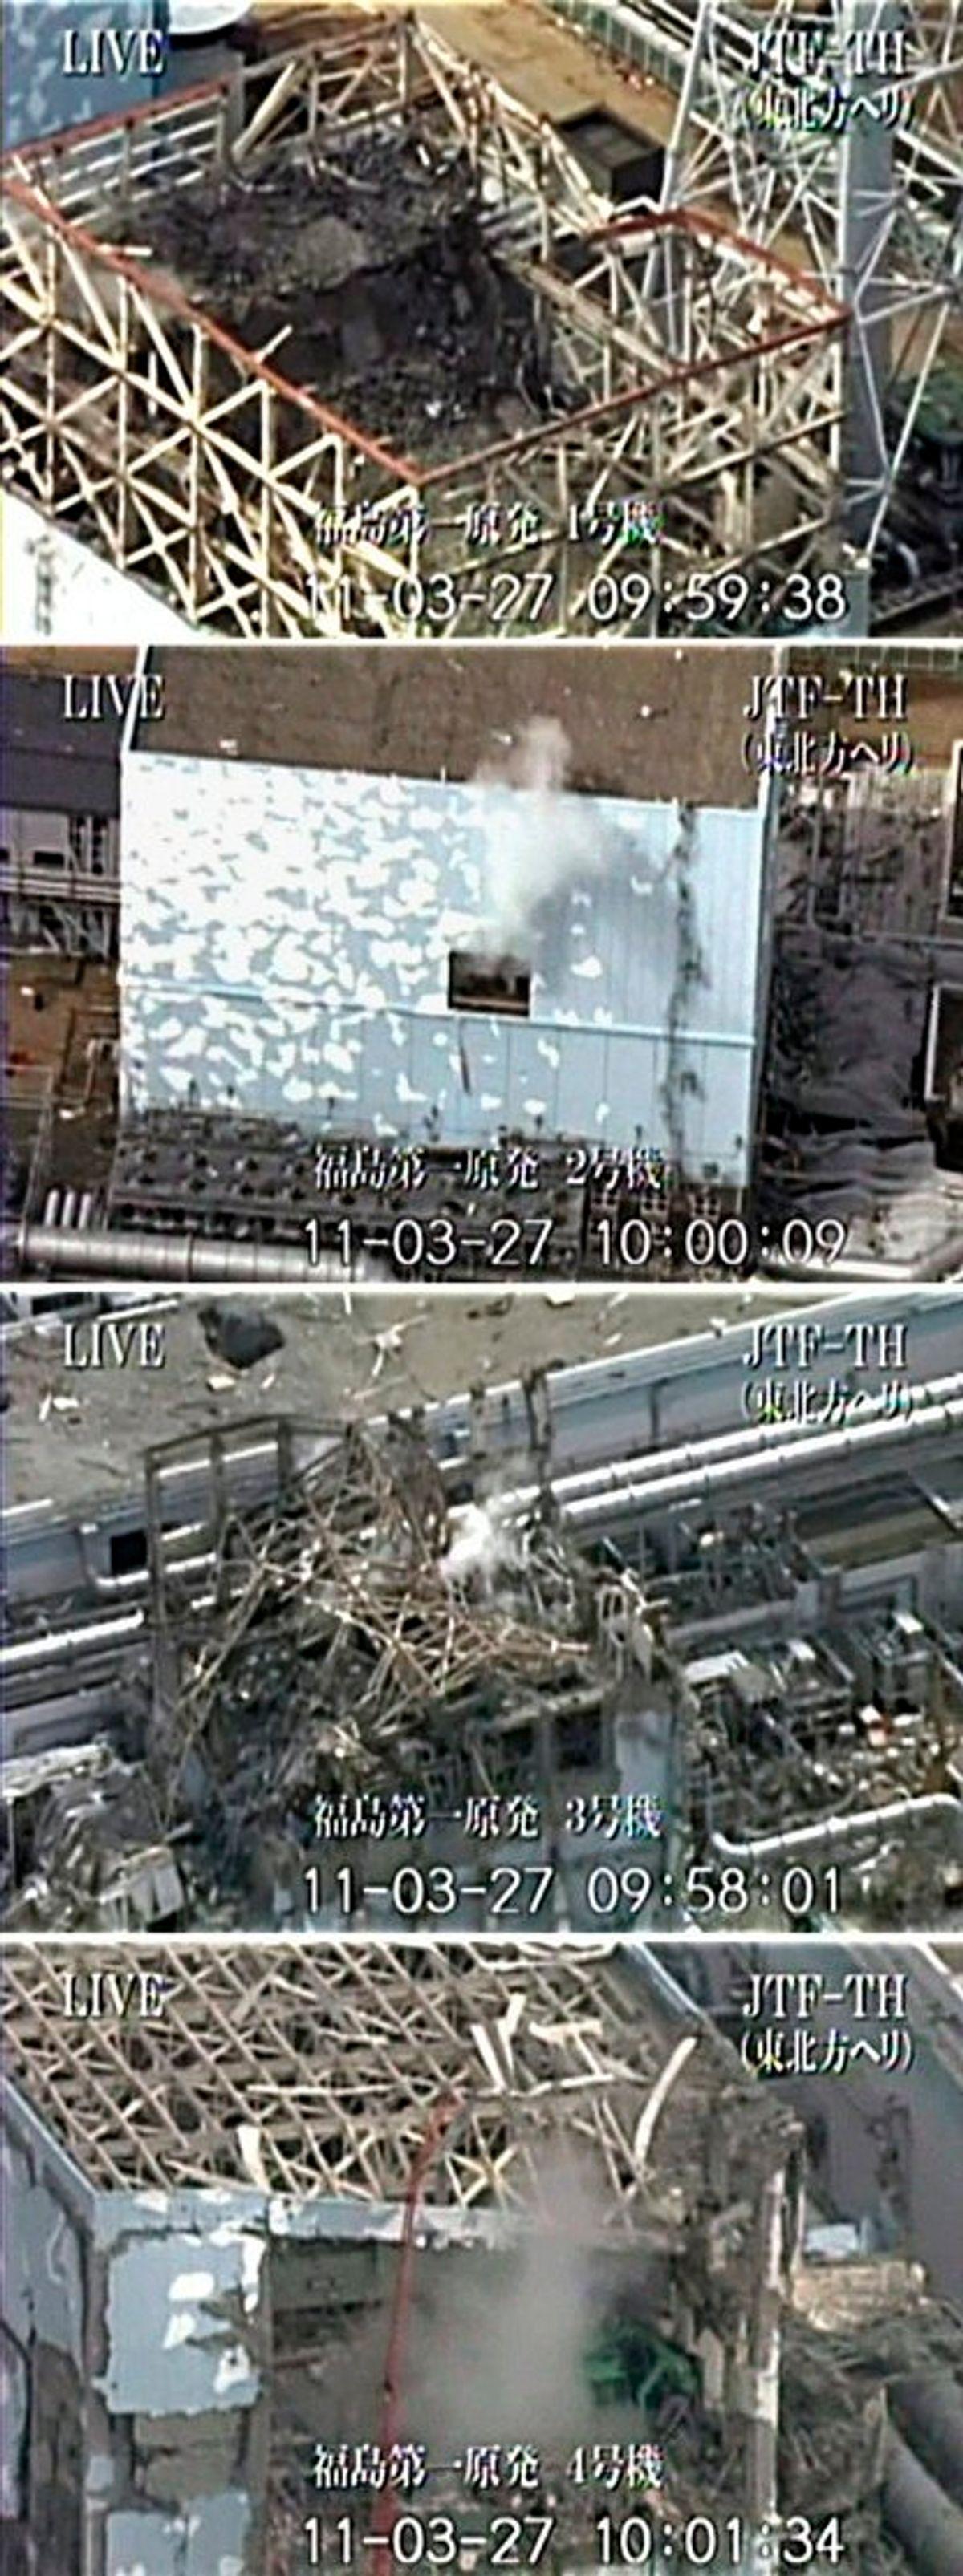 Contaminated Water Discovered in Tunnels at Fukushima Plant